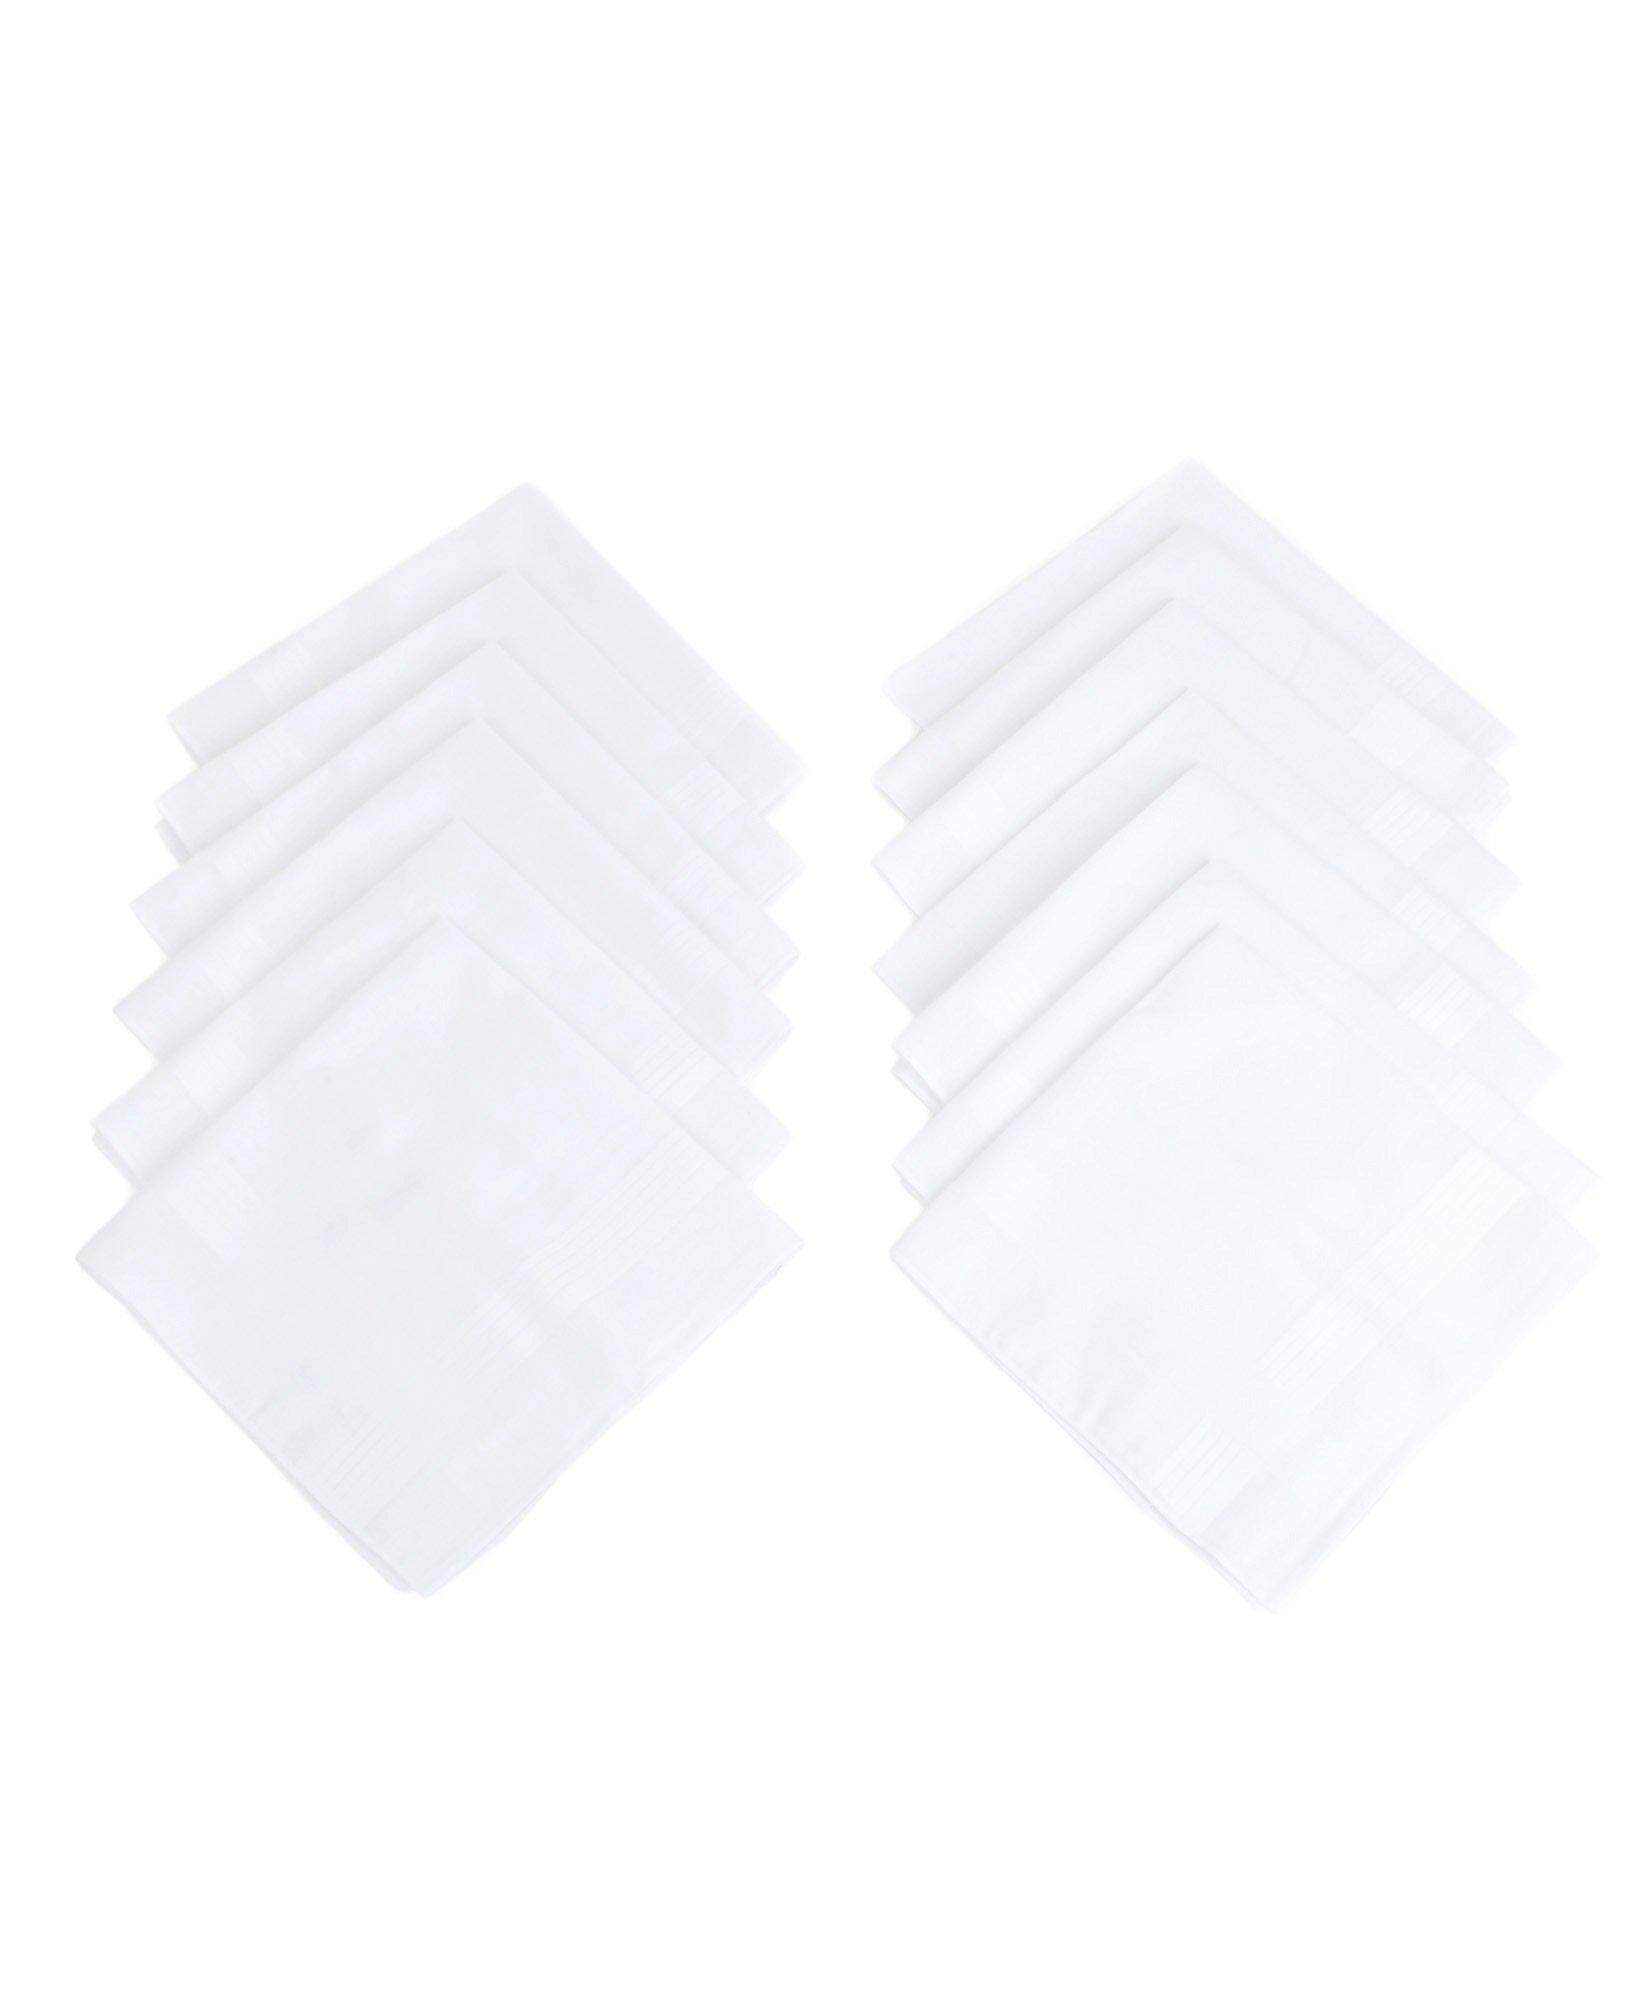 Umo Lorenzo Bakers Dozen Cotton Handkerchiefs 13 pc Set